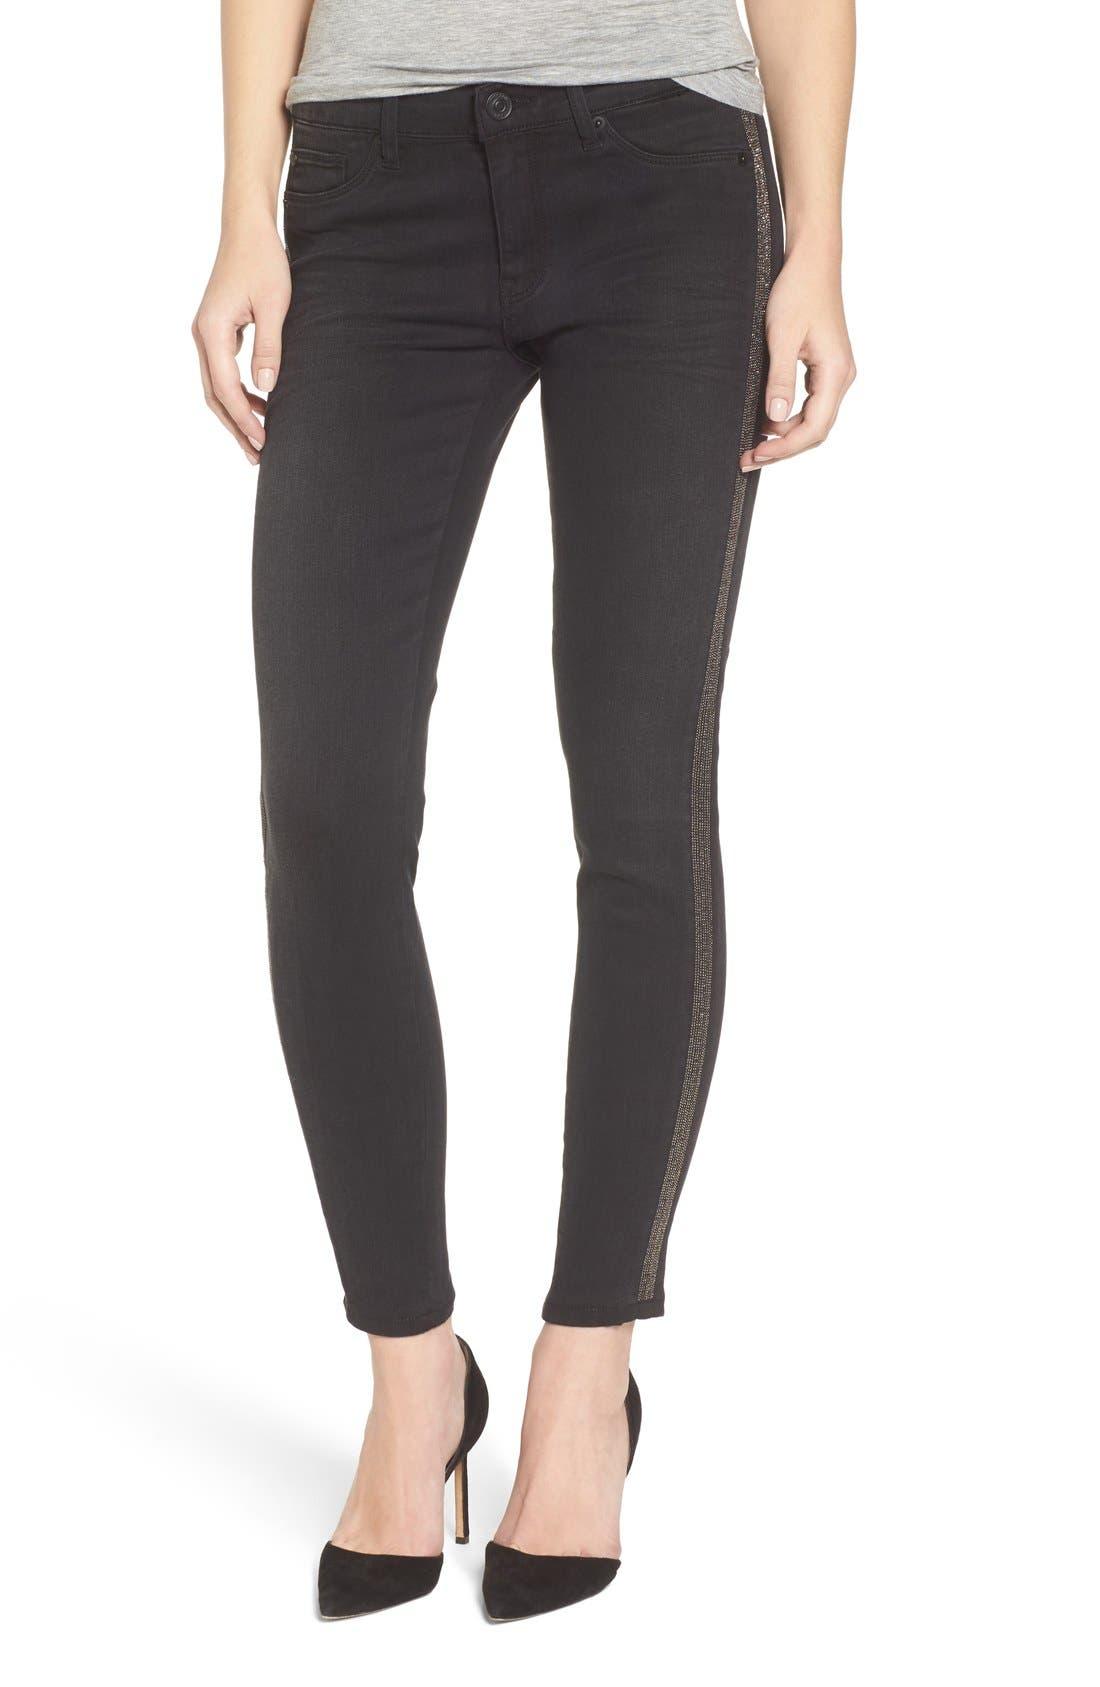 HUDSON JEANS Luna Ankle Metallic Stripe Skinny Jeans